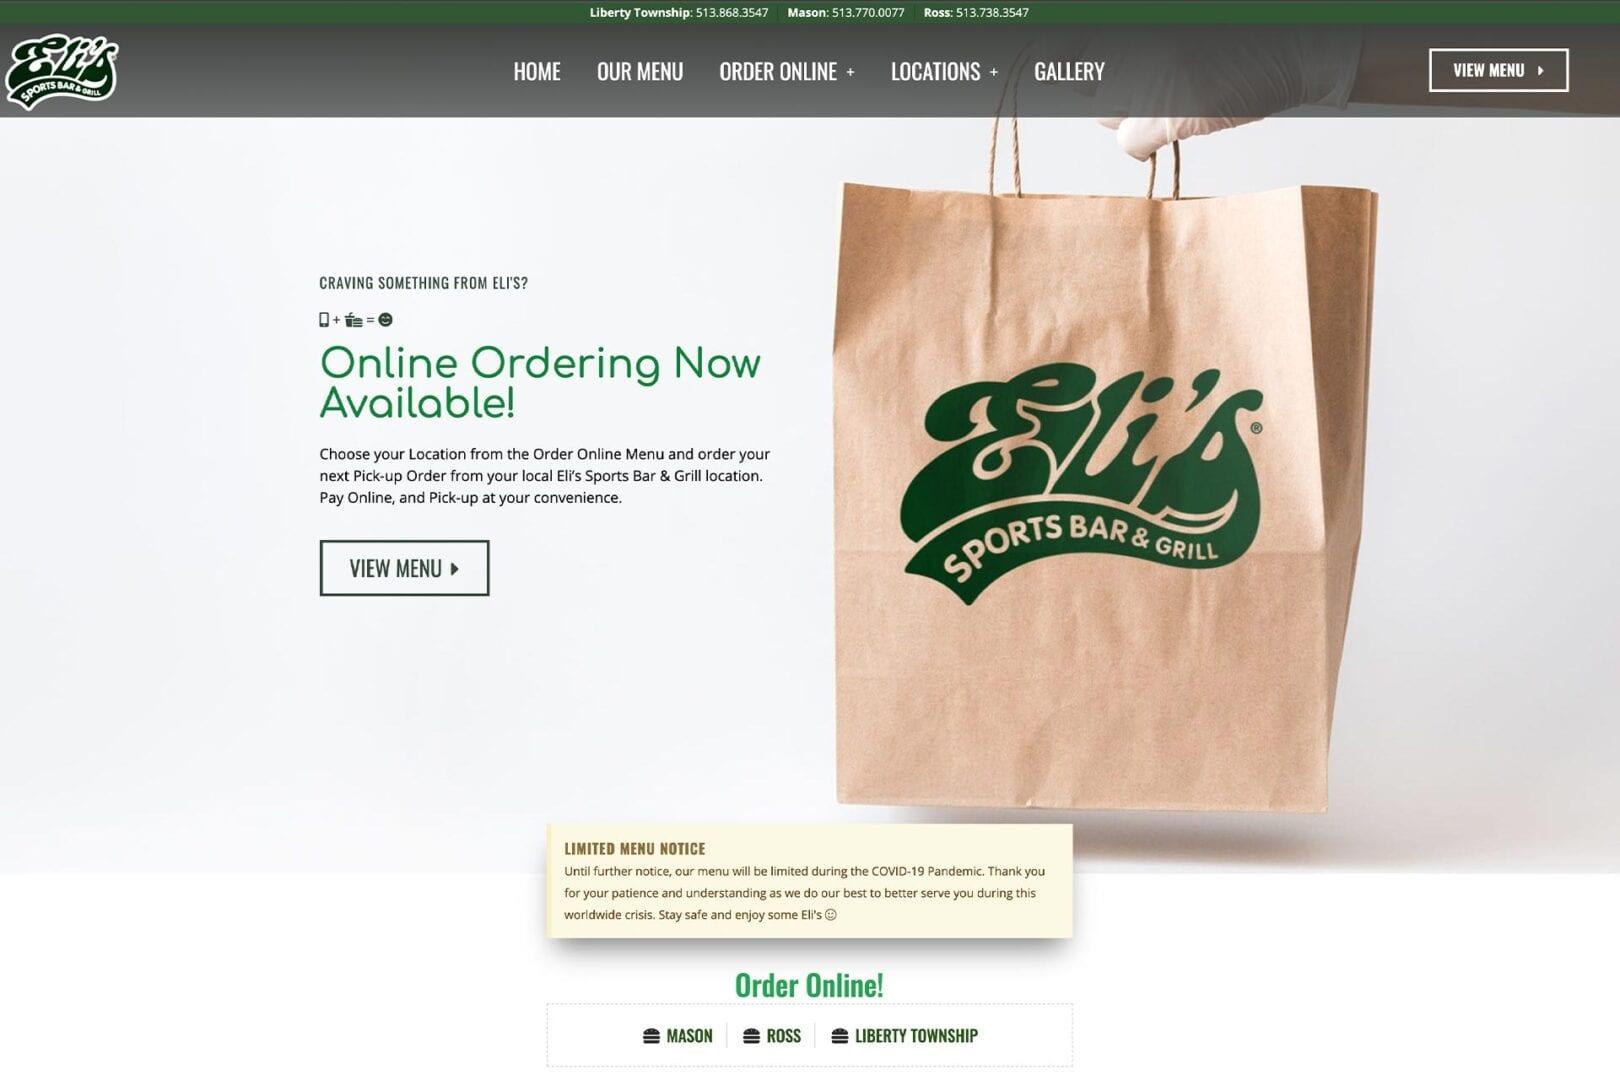 Eli's Sports Bar & Grill located in Cincinnati, Ohio – bizProWeb Restaurant Web Builder